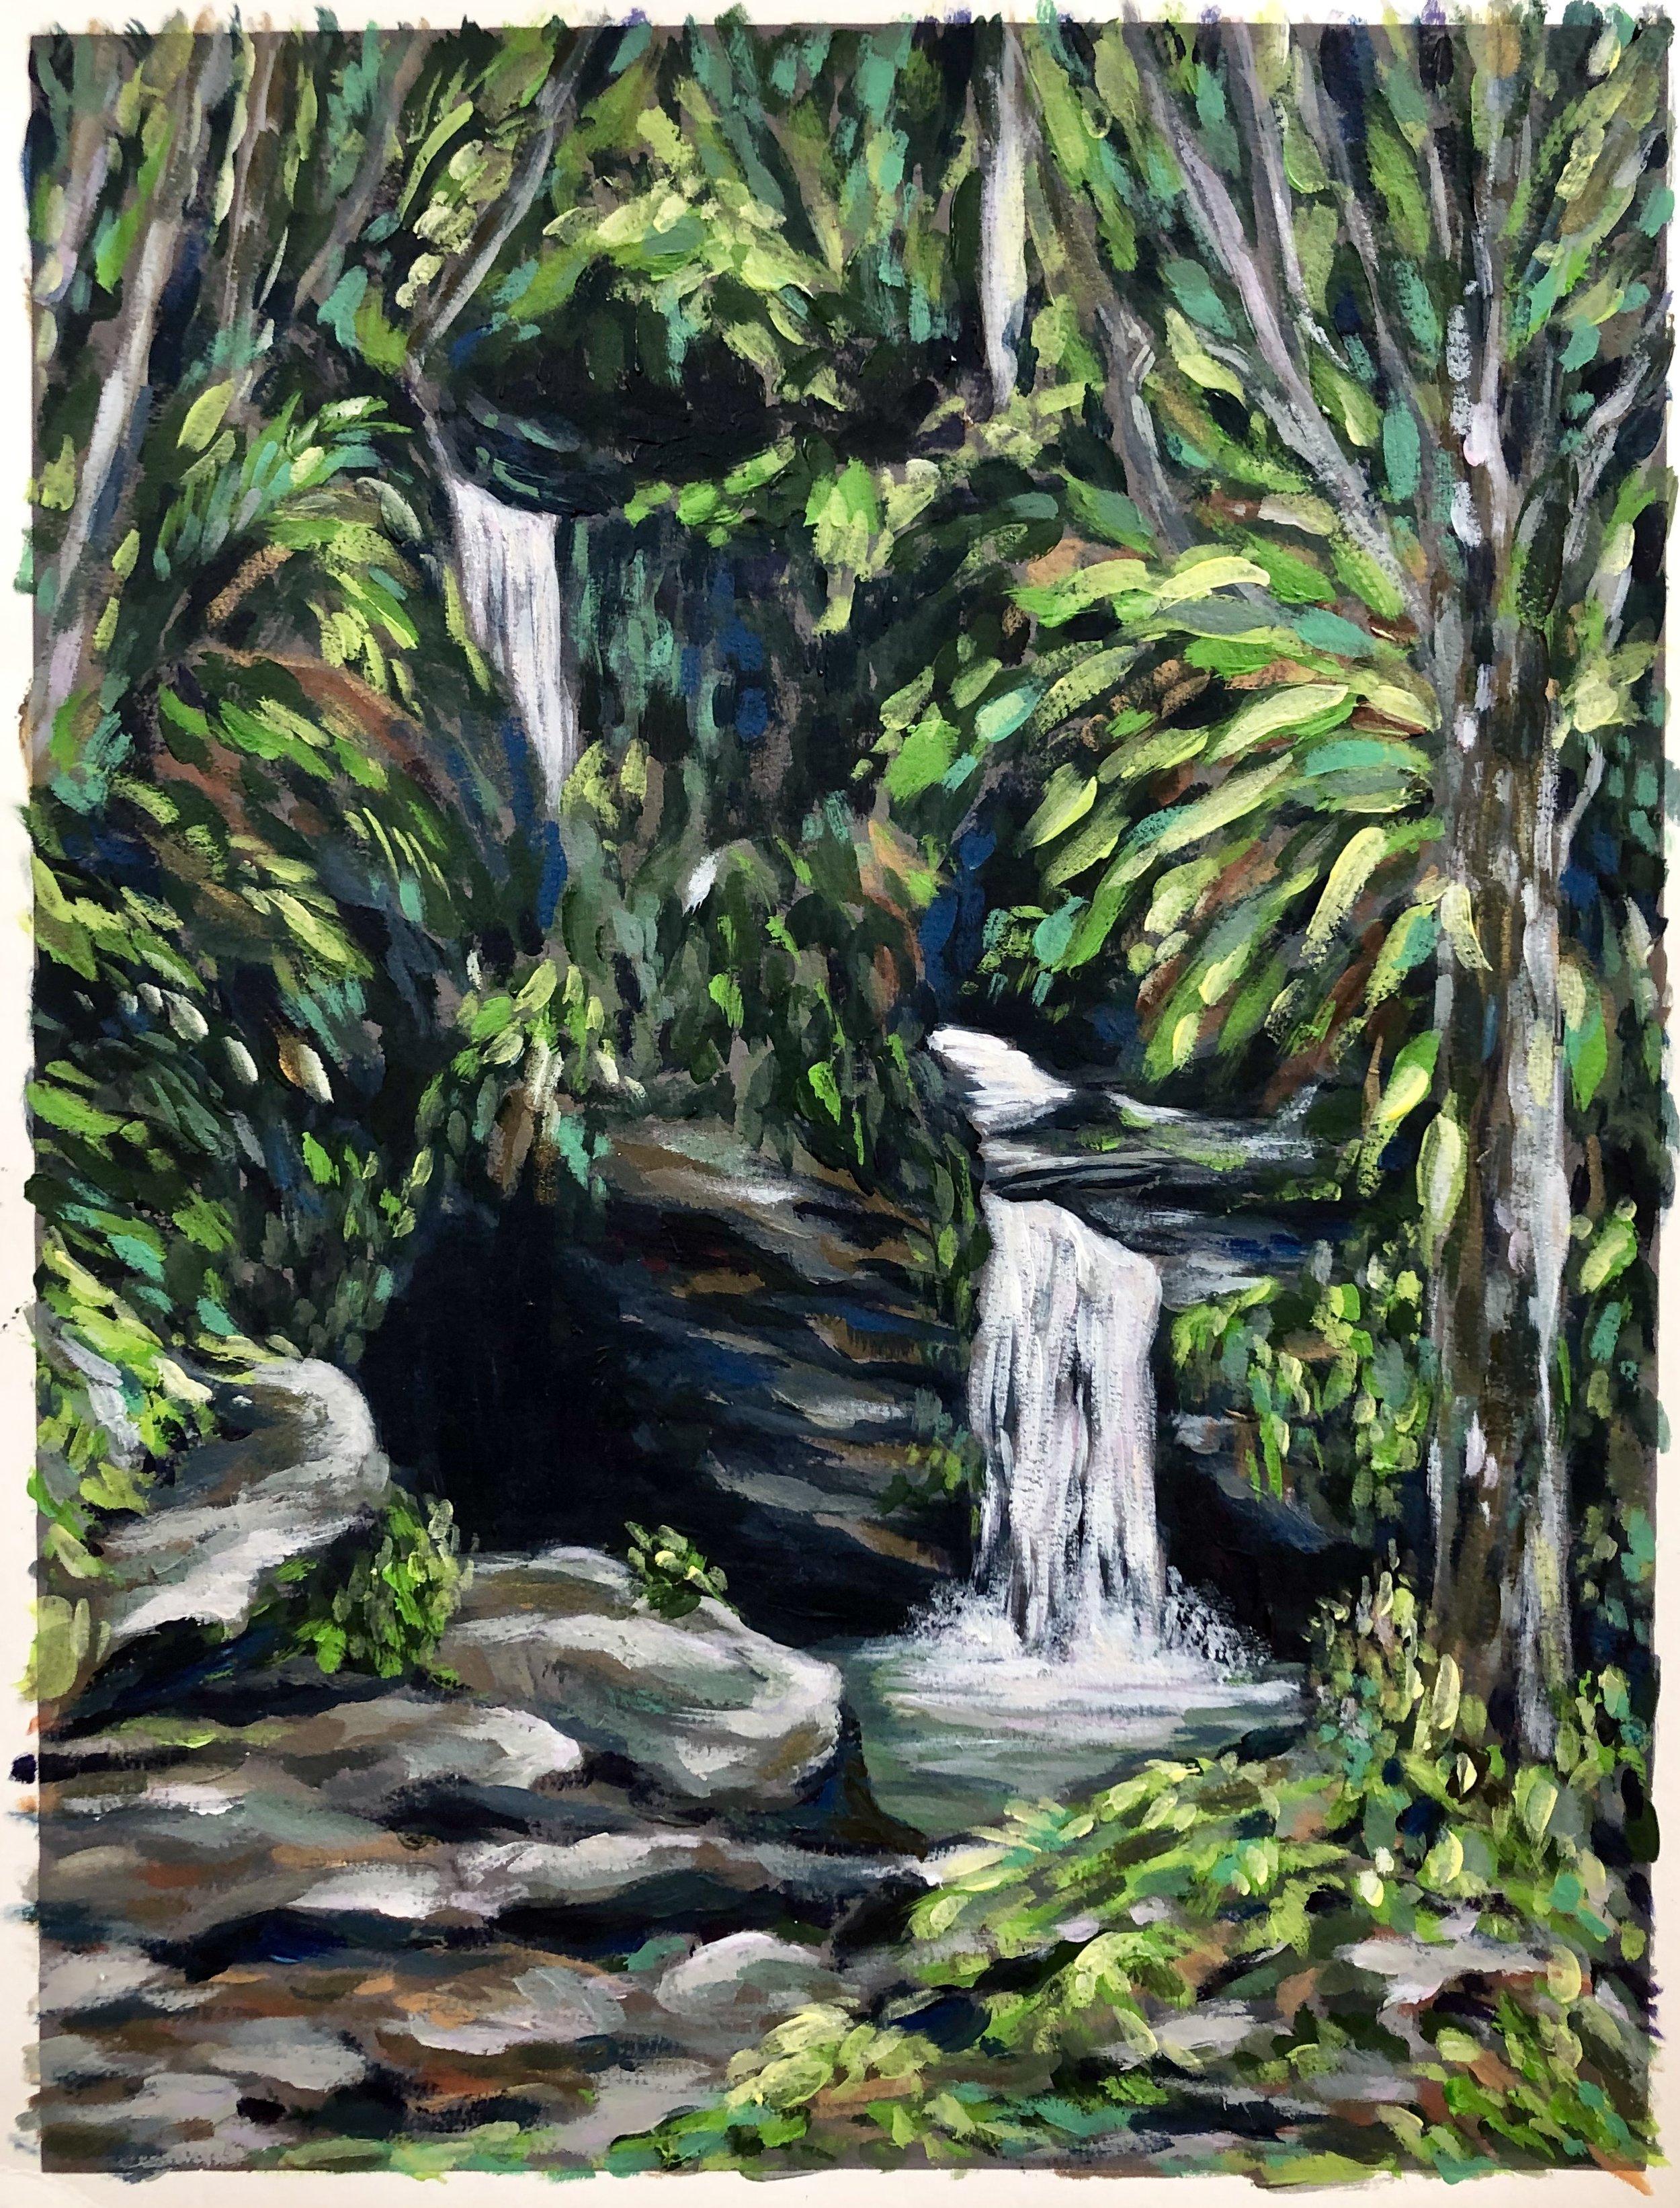 Diego Falls - El Yunque National Forest, Puerto Rico